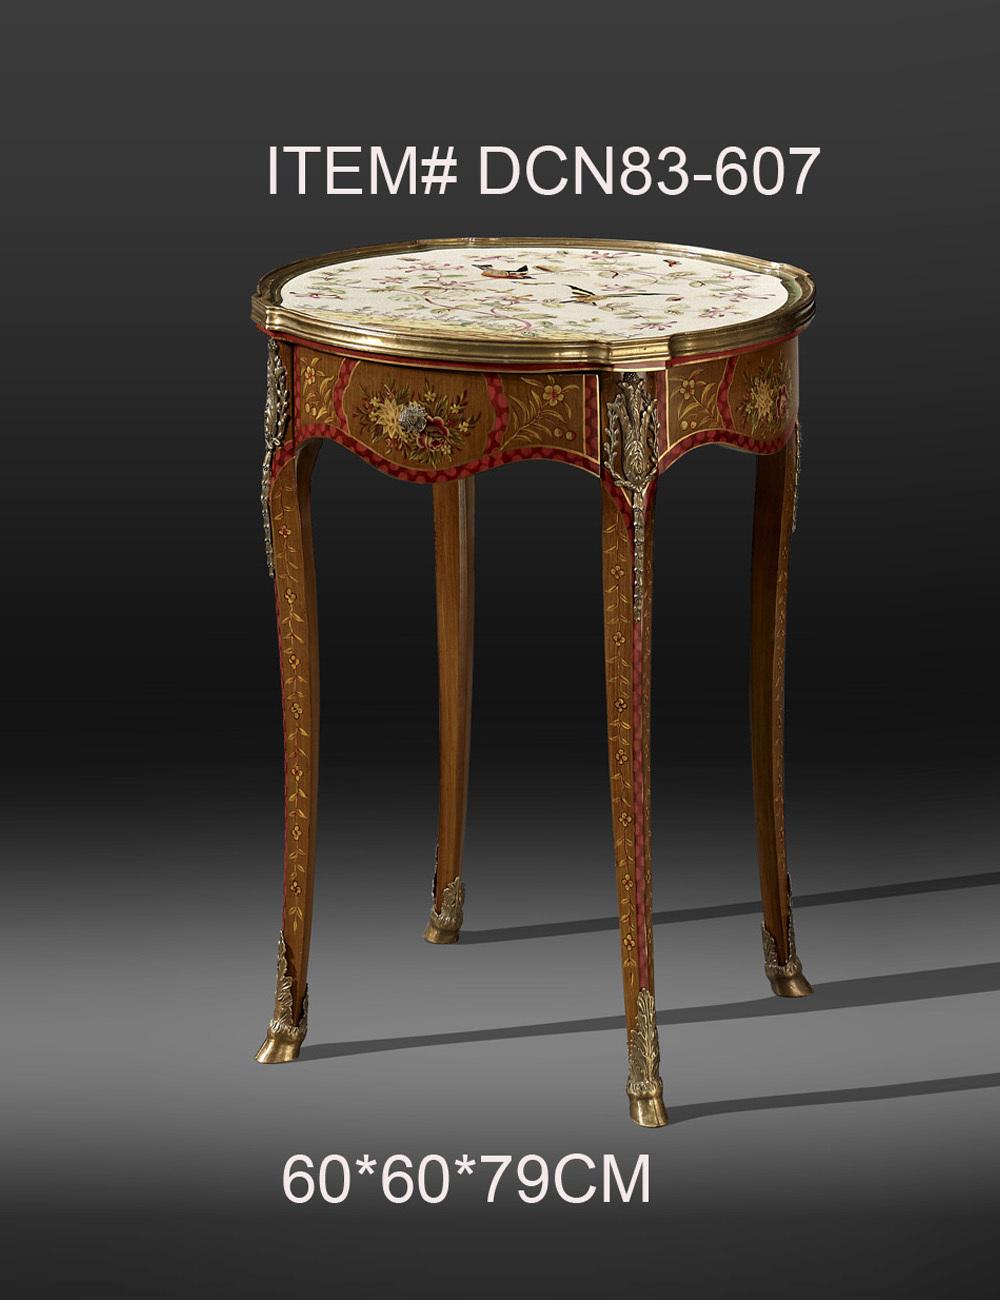 European Style Antique Porcelain Mosaic Brass Decorative Painted Round Console Table Luxury Ceramic Home Decor<br><br>Aliexpress